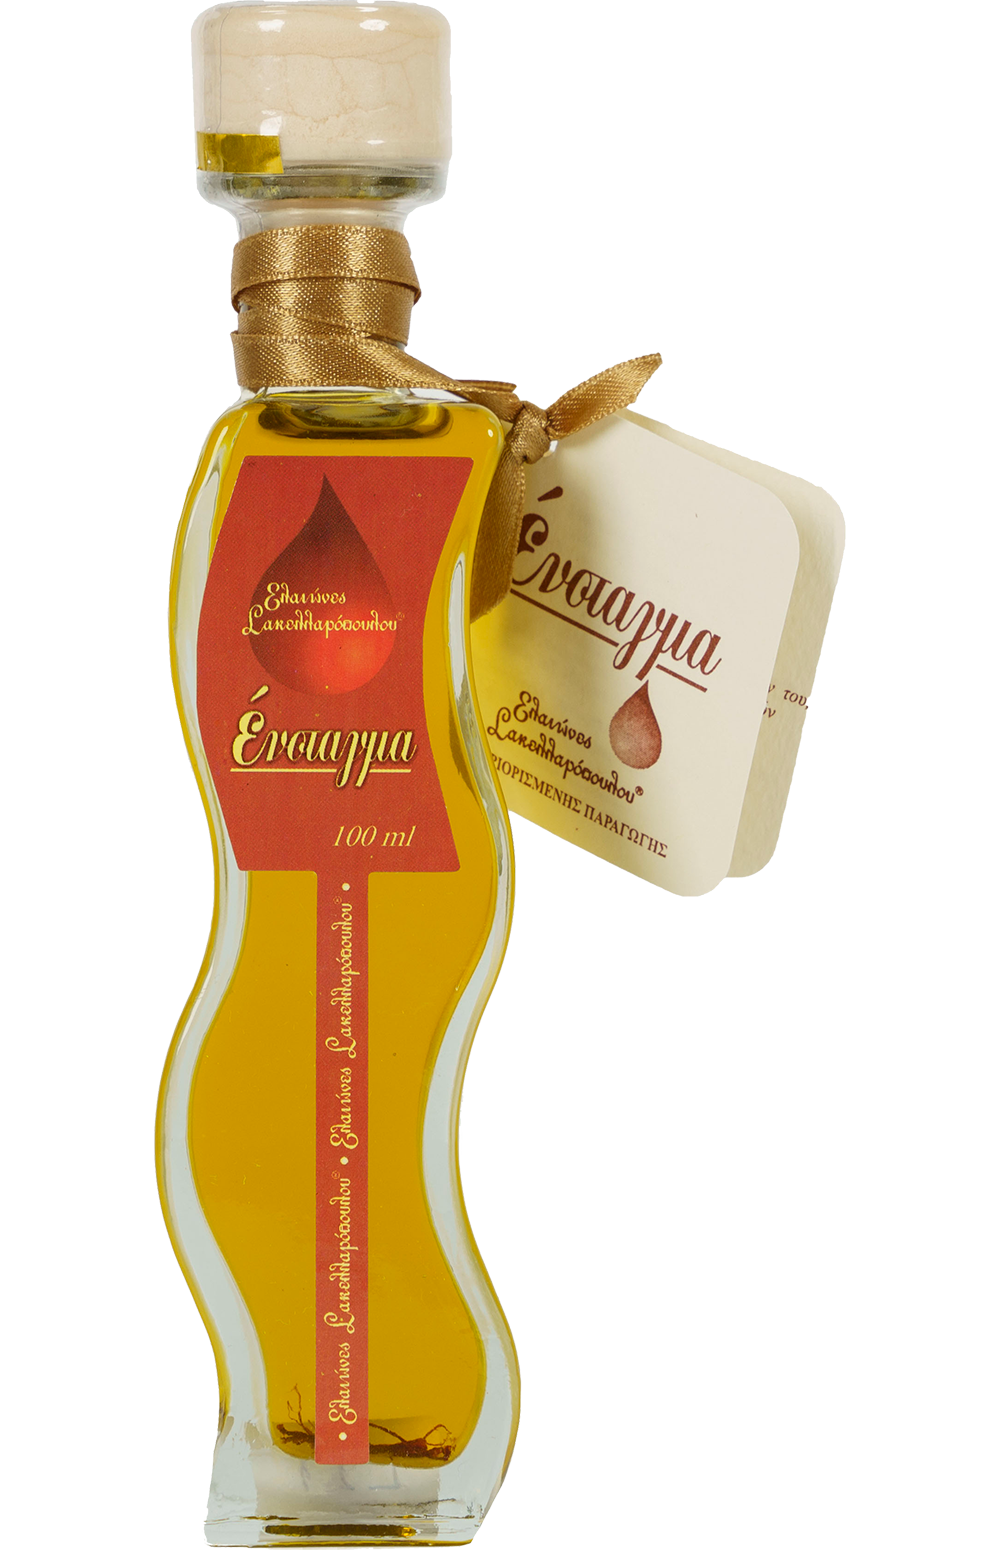 Enstagma Gourmet Evoo Saffron